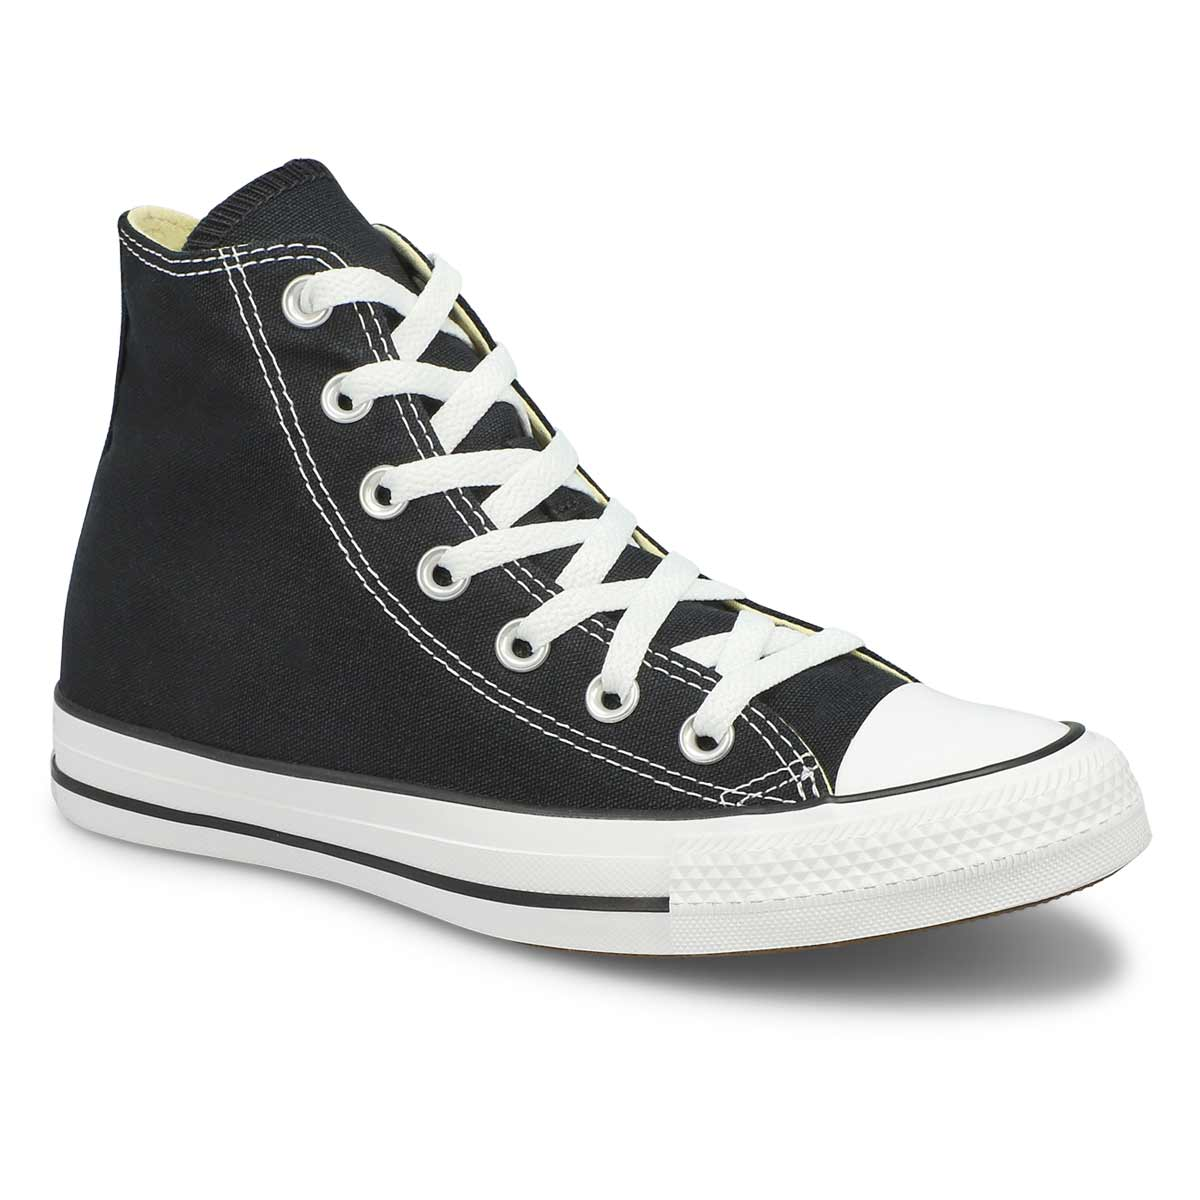 Women's CHUCK TAYLOR CORE HI black sneakers